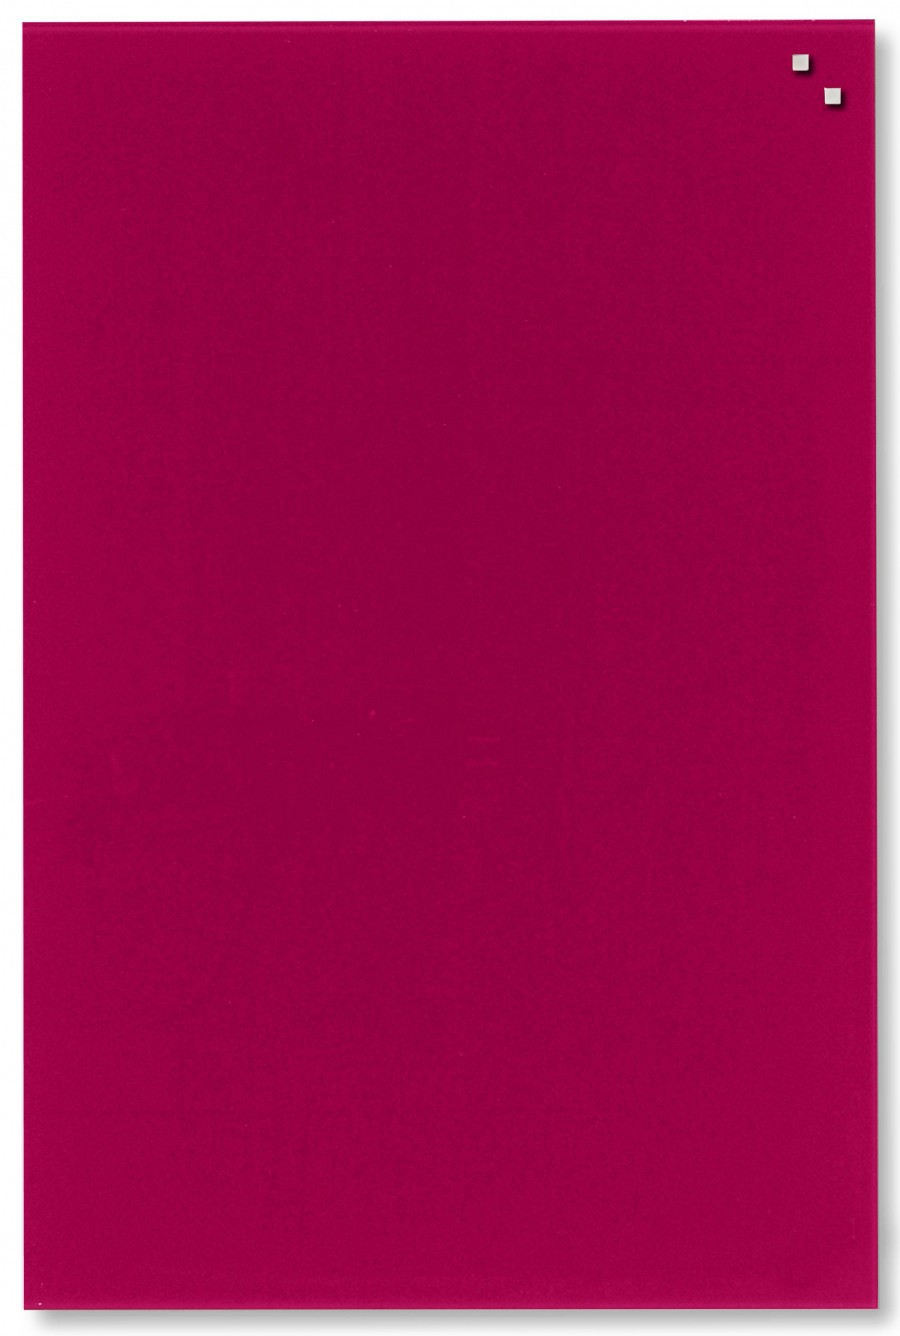 Glastavla Magnetisk 40x60 cm Röd